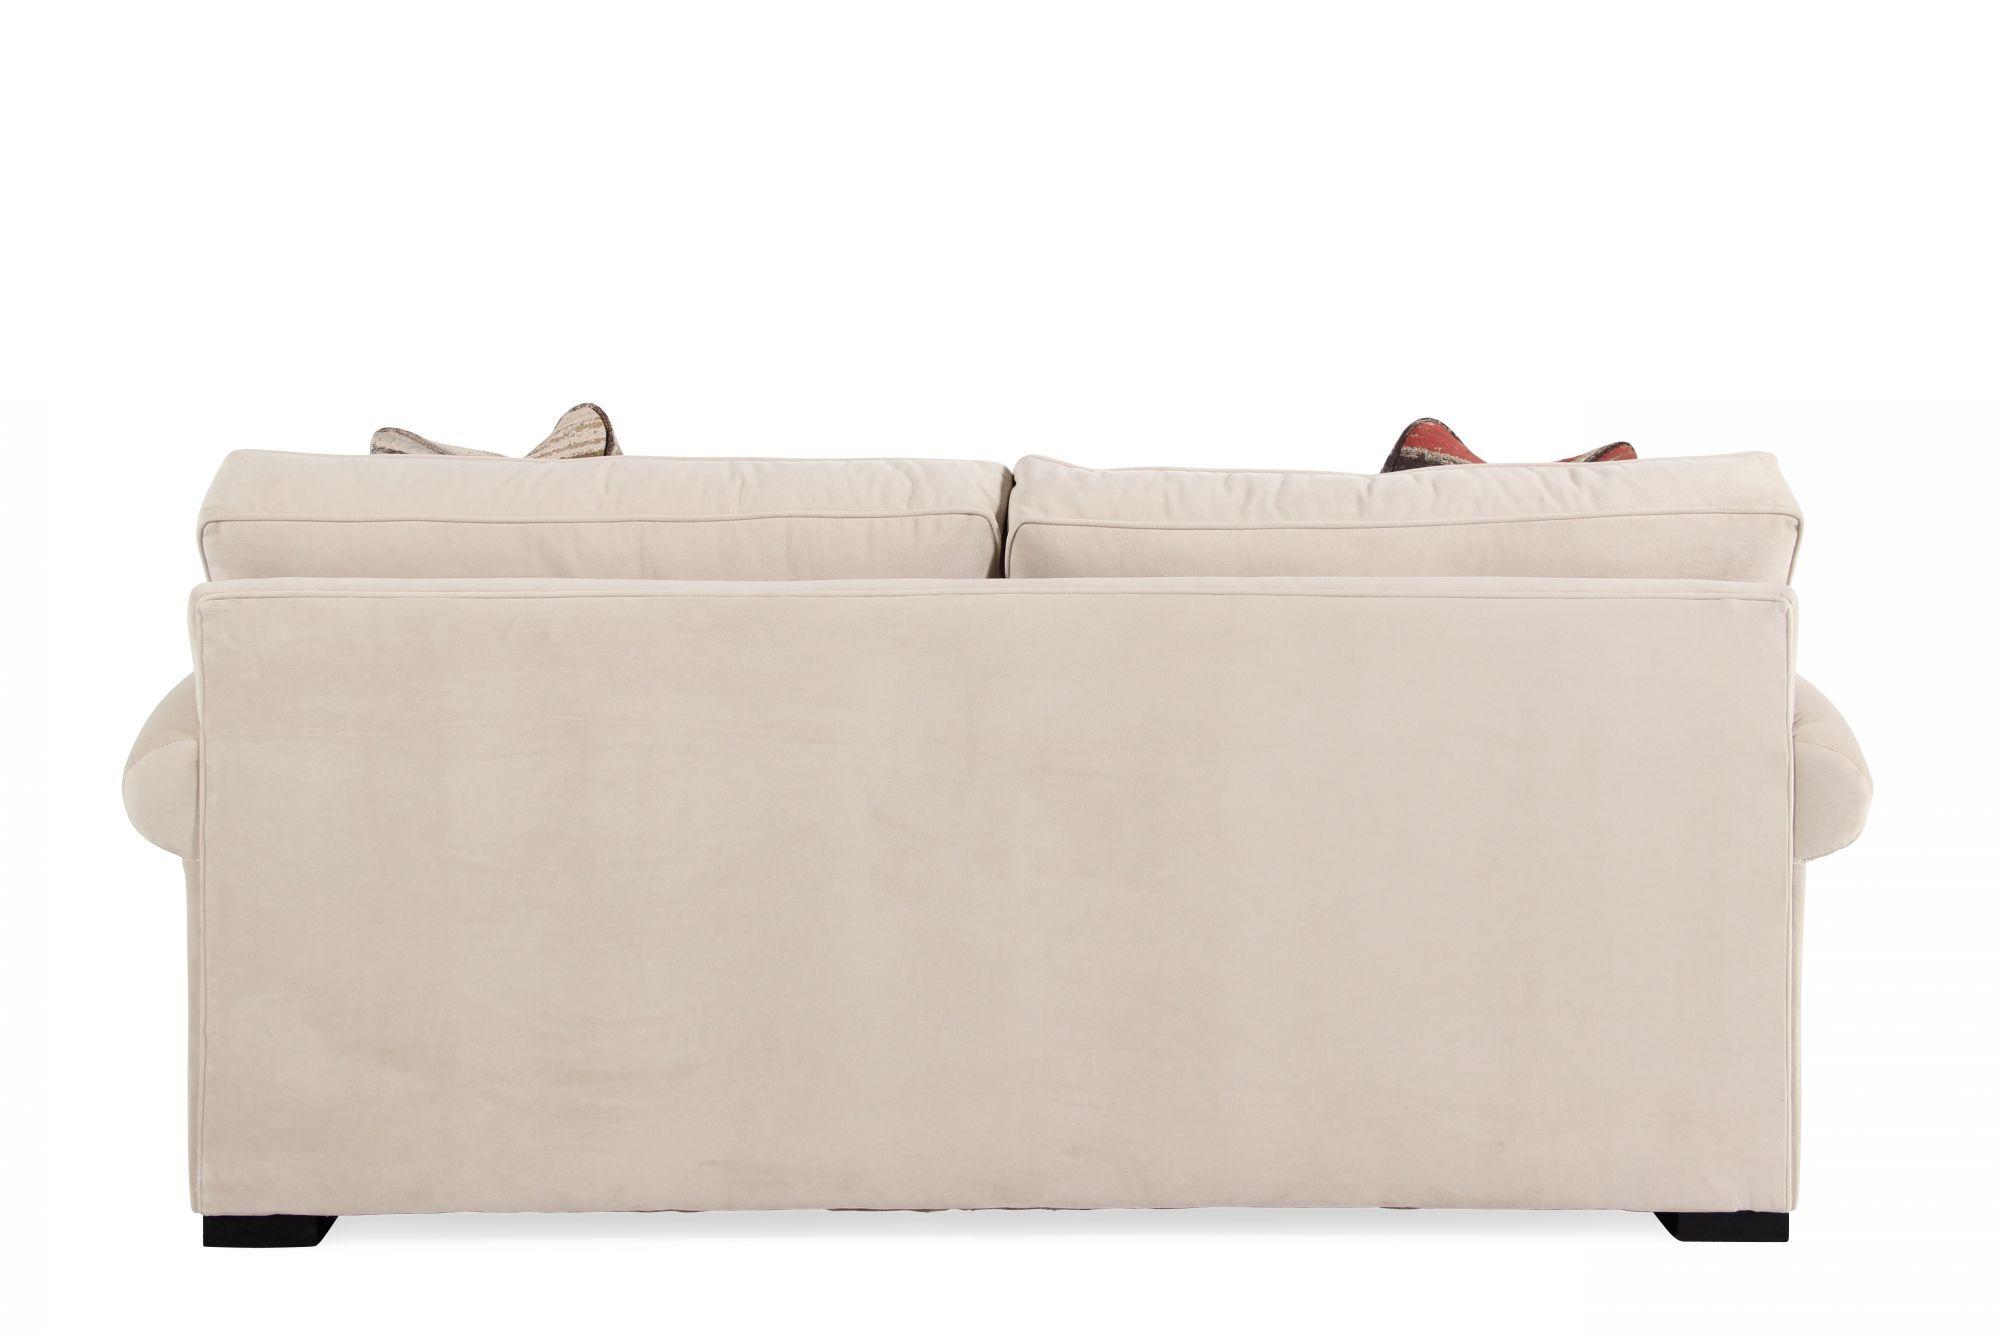 sh memory foam sleeper sofa mattress side table with shelf jonathan louis buck queen mathis